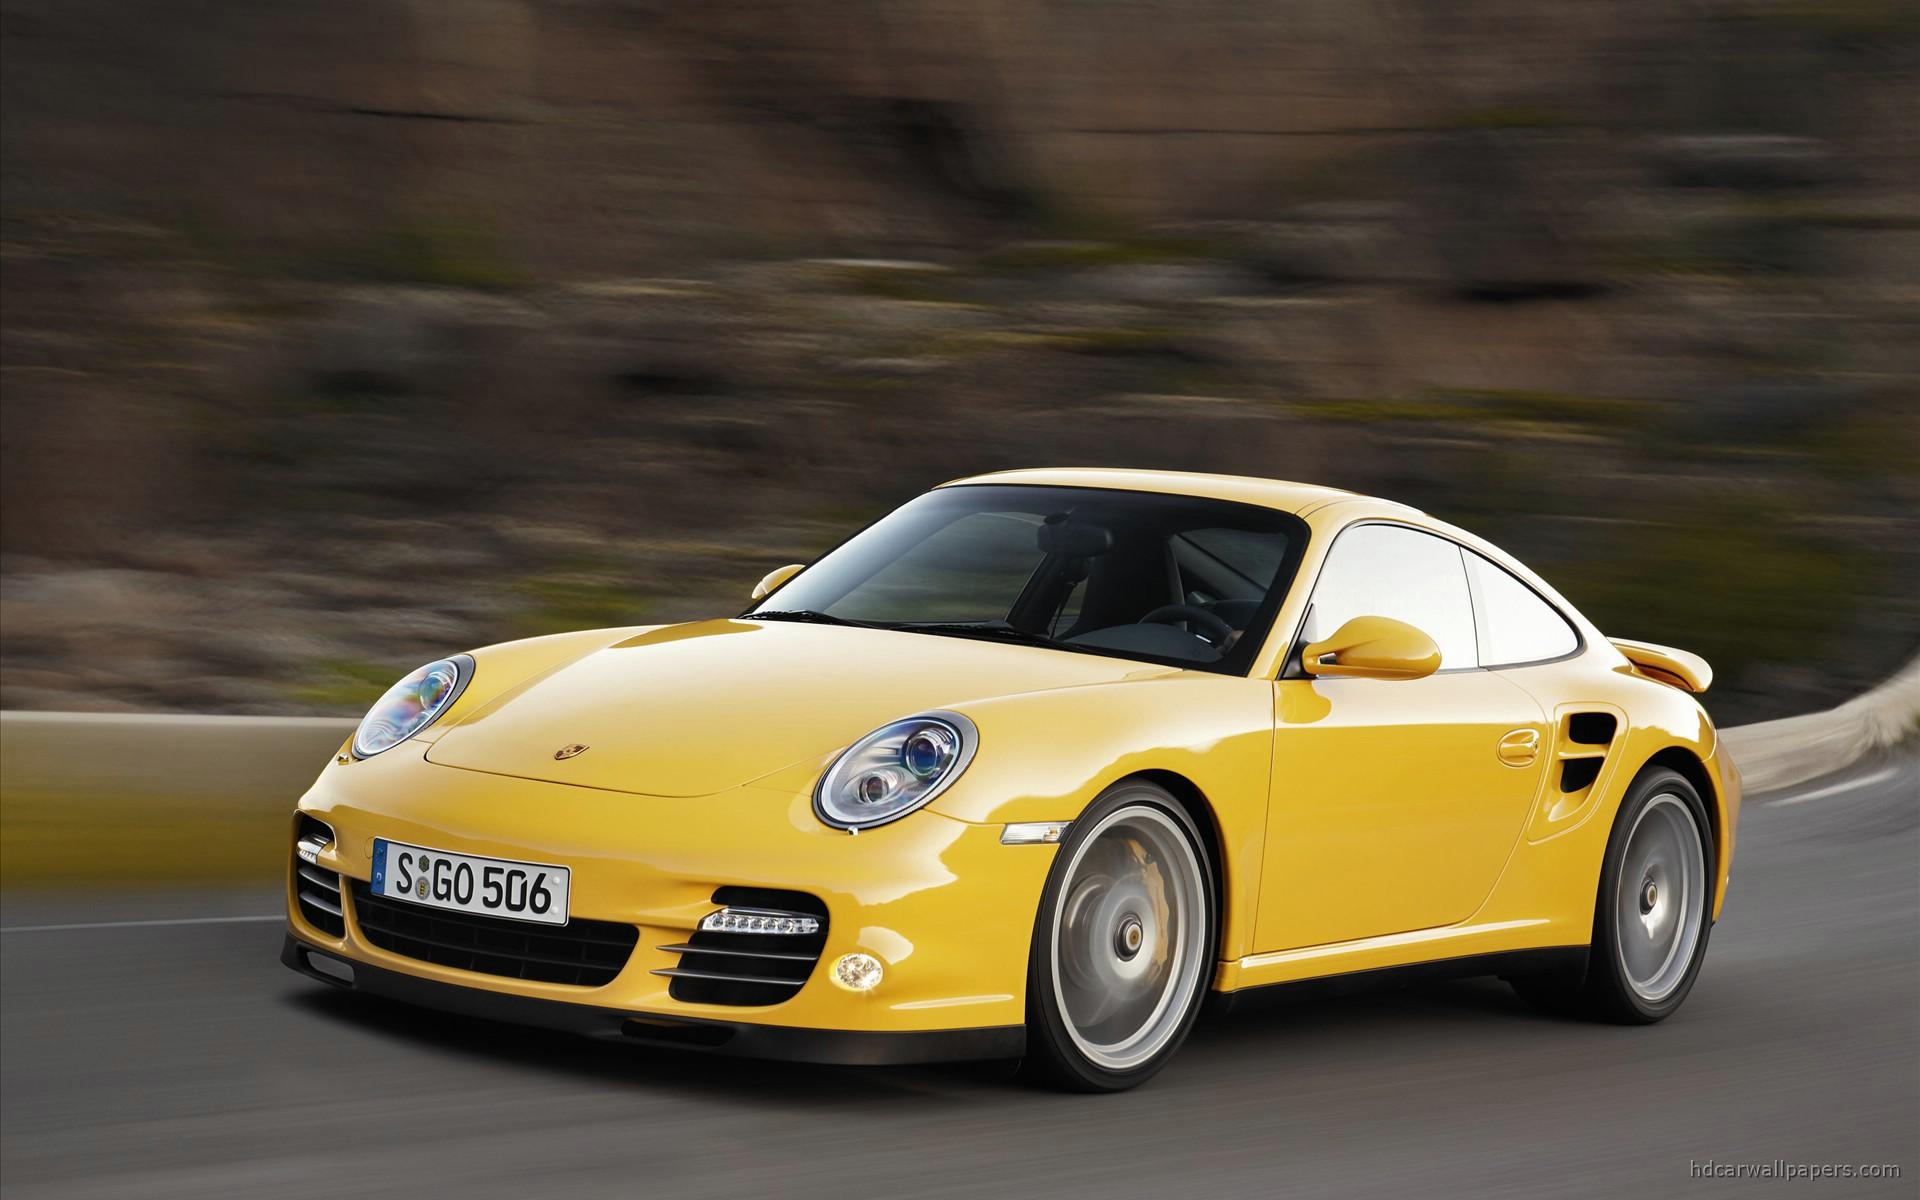 2010 Porsche 911 Turbo Facebook Covers Wallpapers HD 1920x1200